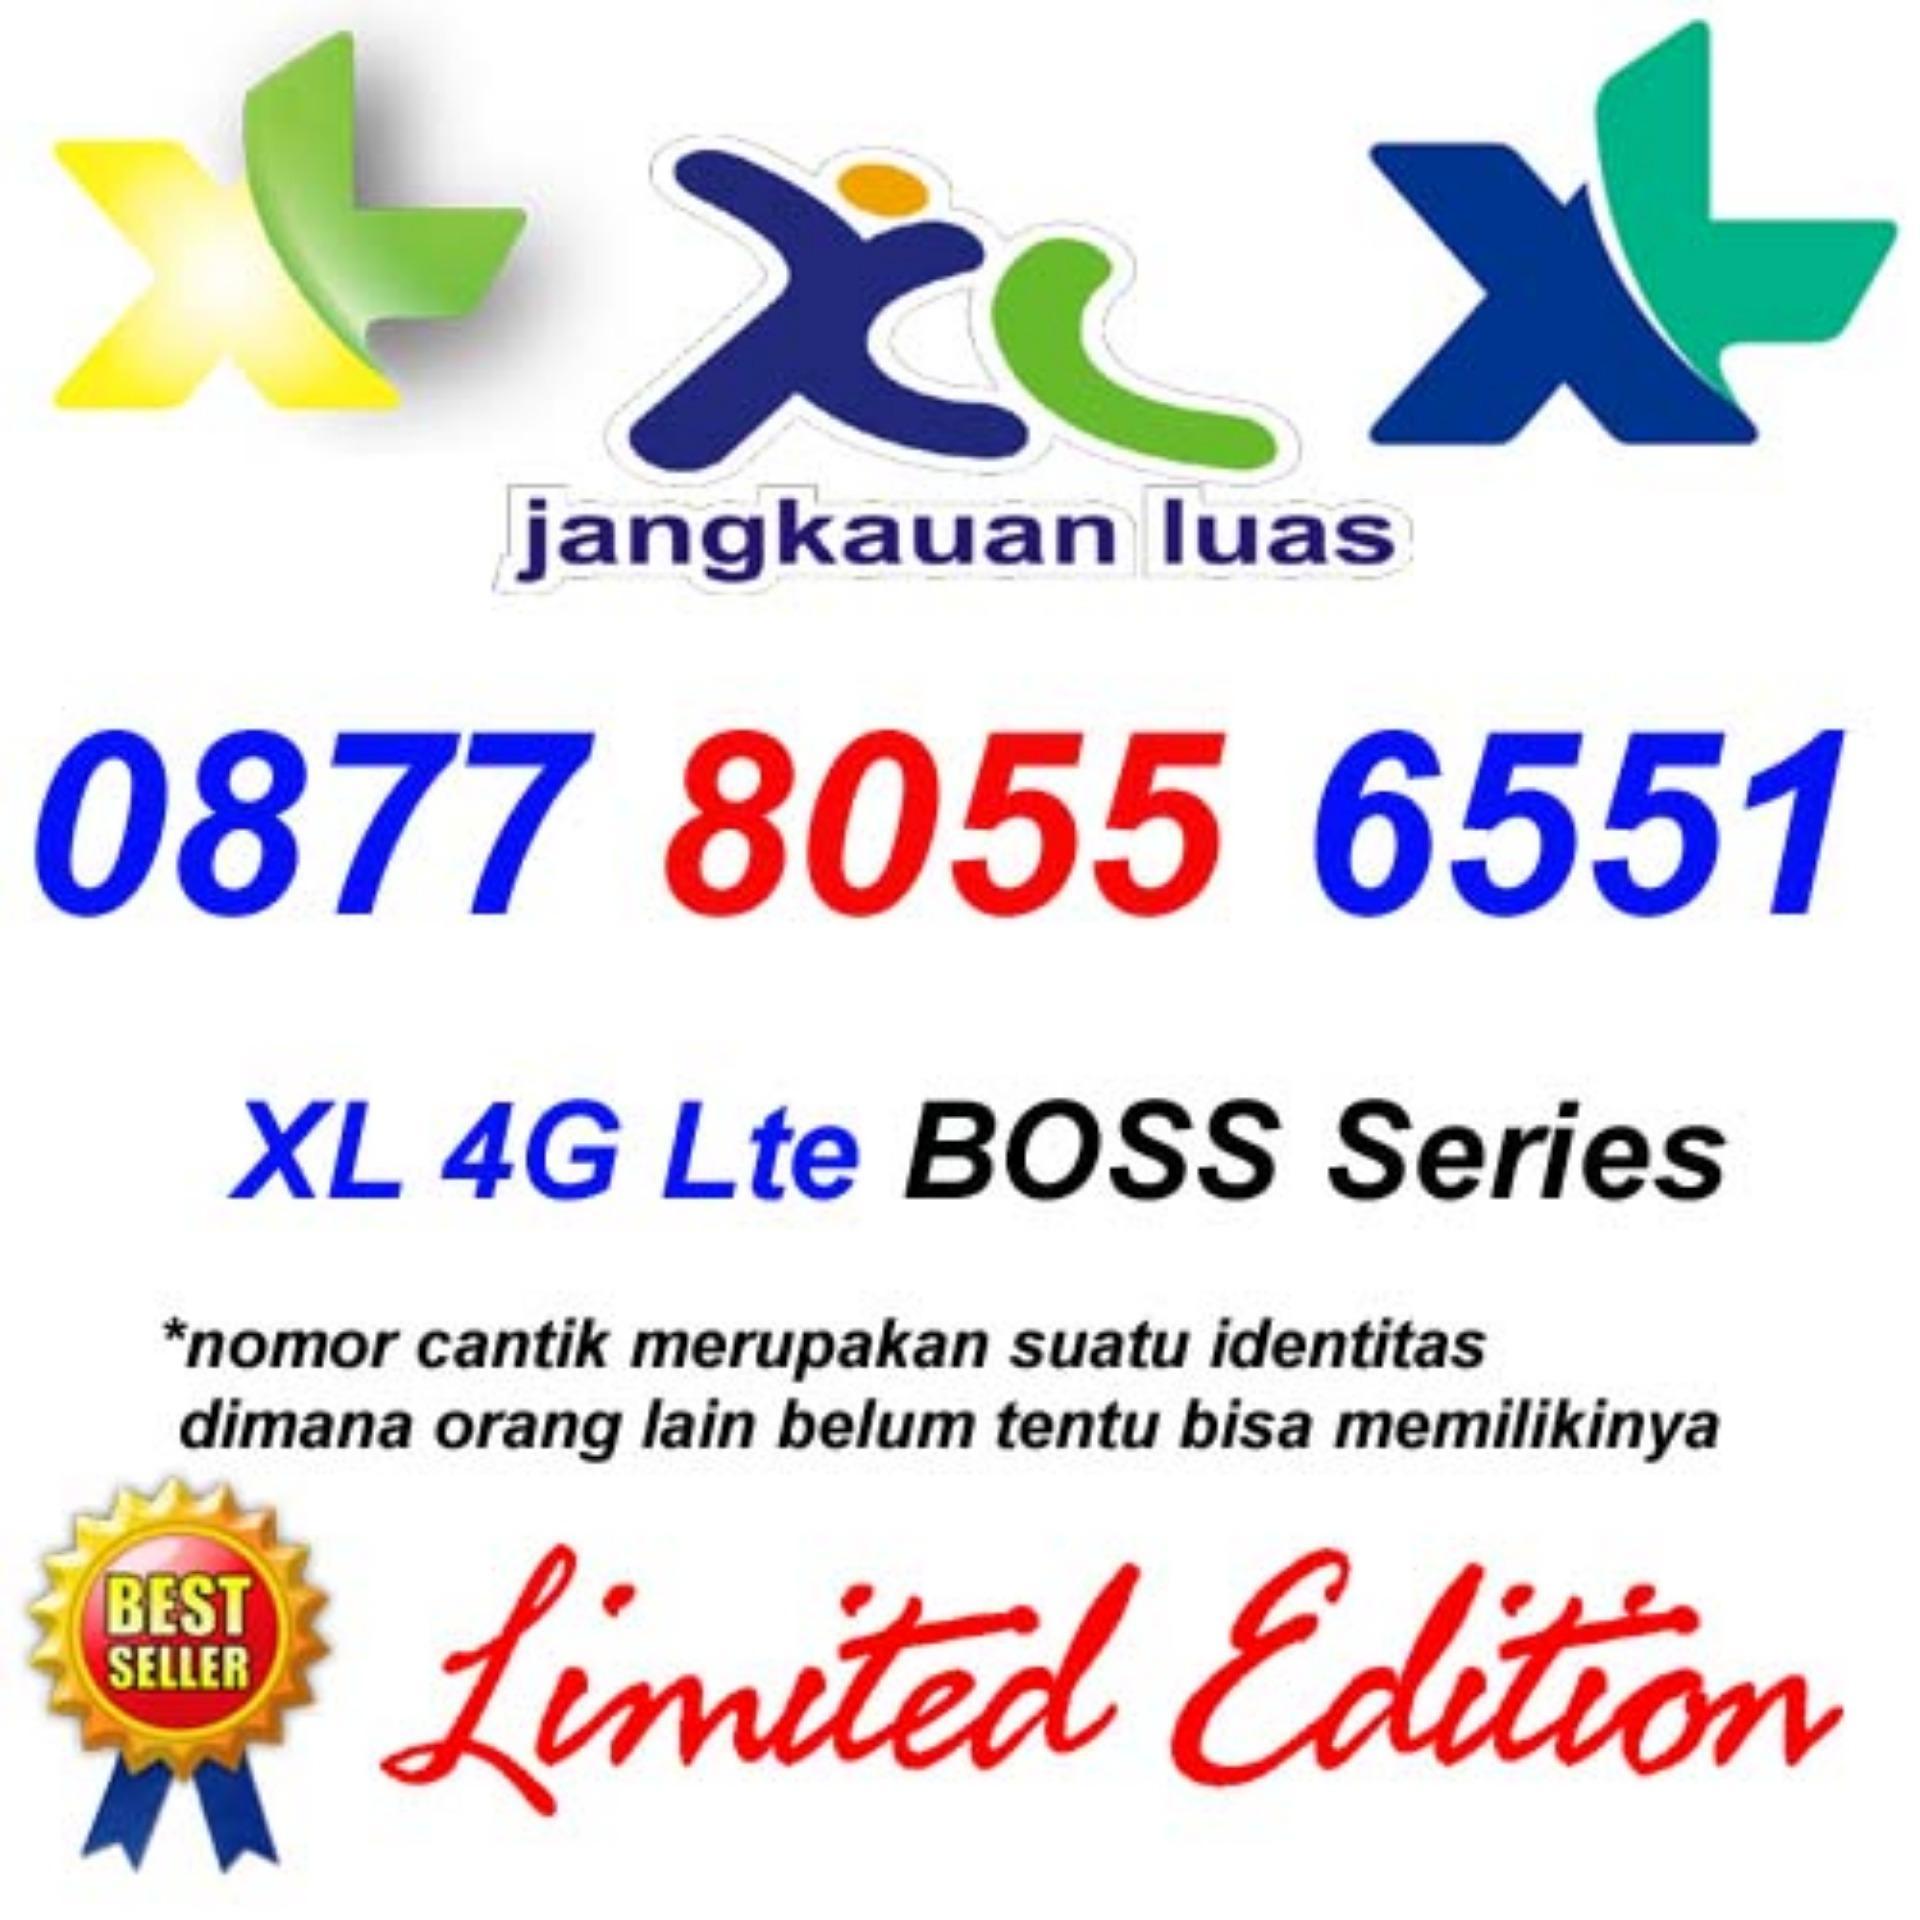 Kartu XL 4G LTE 0877 80 556 551 Perdana Nomor Cantik Combo Xtra